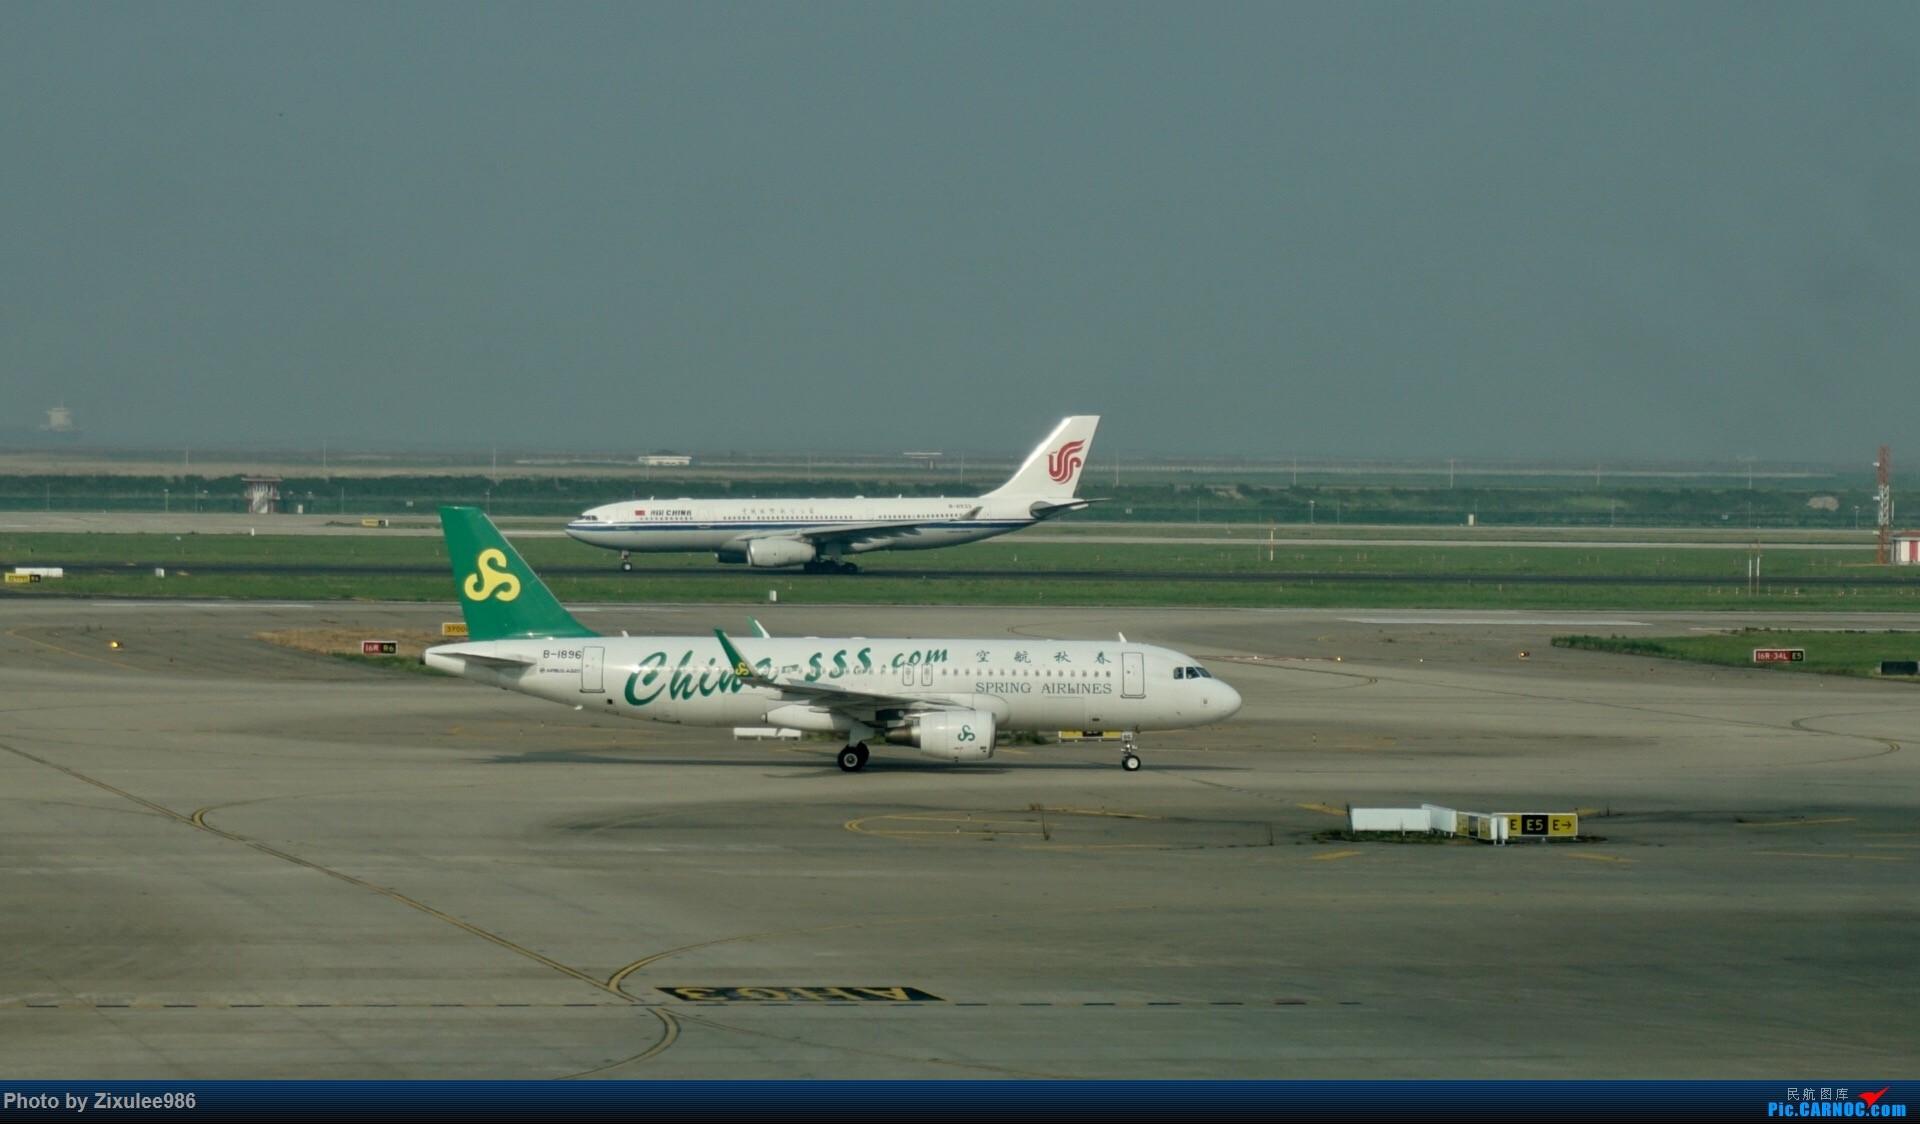 Re:[原创]加拿大21日游学之旅(一)~JJN-PVG-YYZ..(内含flightlog)~第一次发游记~多图缓更请谅解 AIRBUS A320-200 B-1896 中国上海浦东国际机场